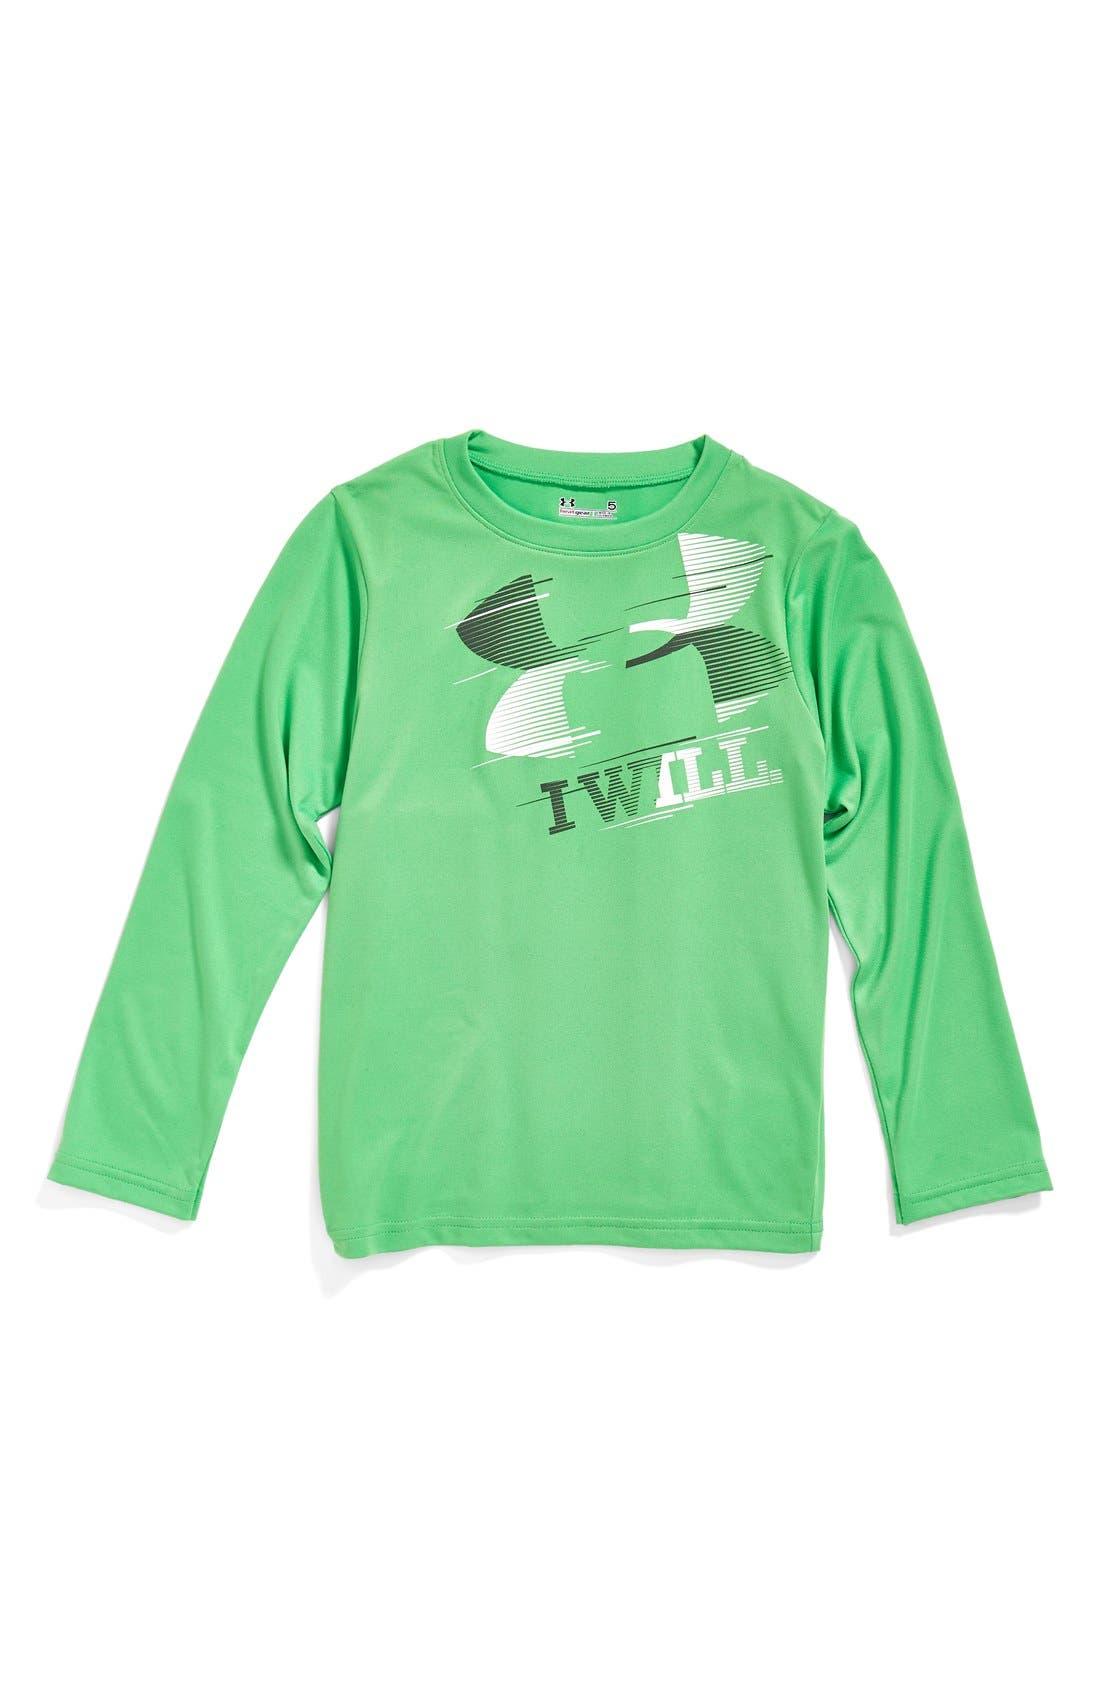 Alternate Image 1 Selected - Under Armour 'I Will' HeatGear® Long Sleeve T-Shirt (Toddler Boys & Little Boys)